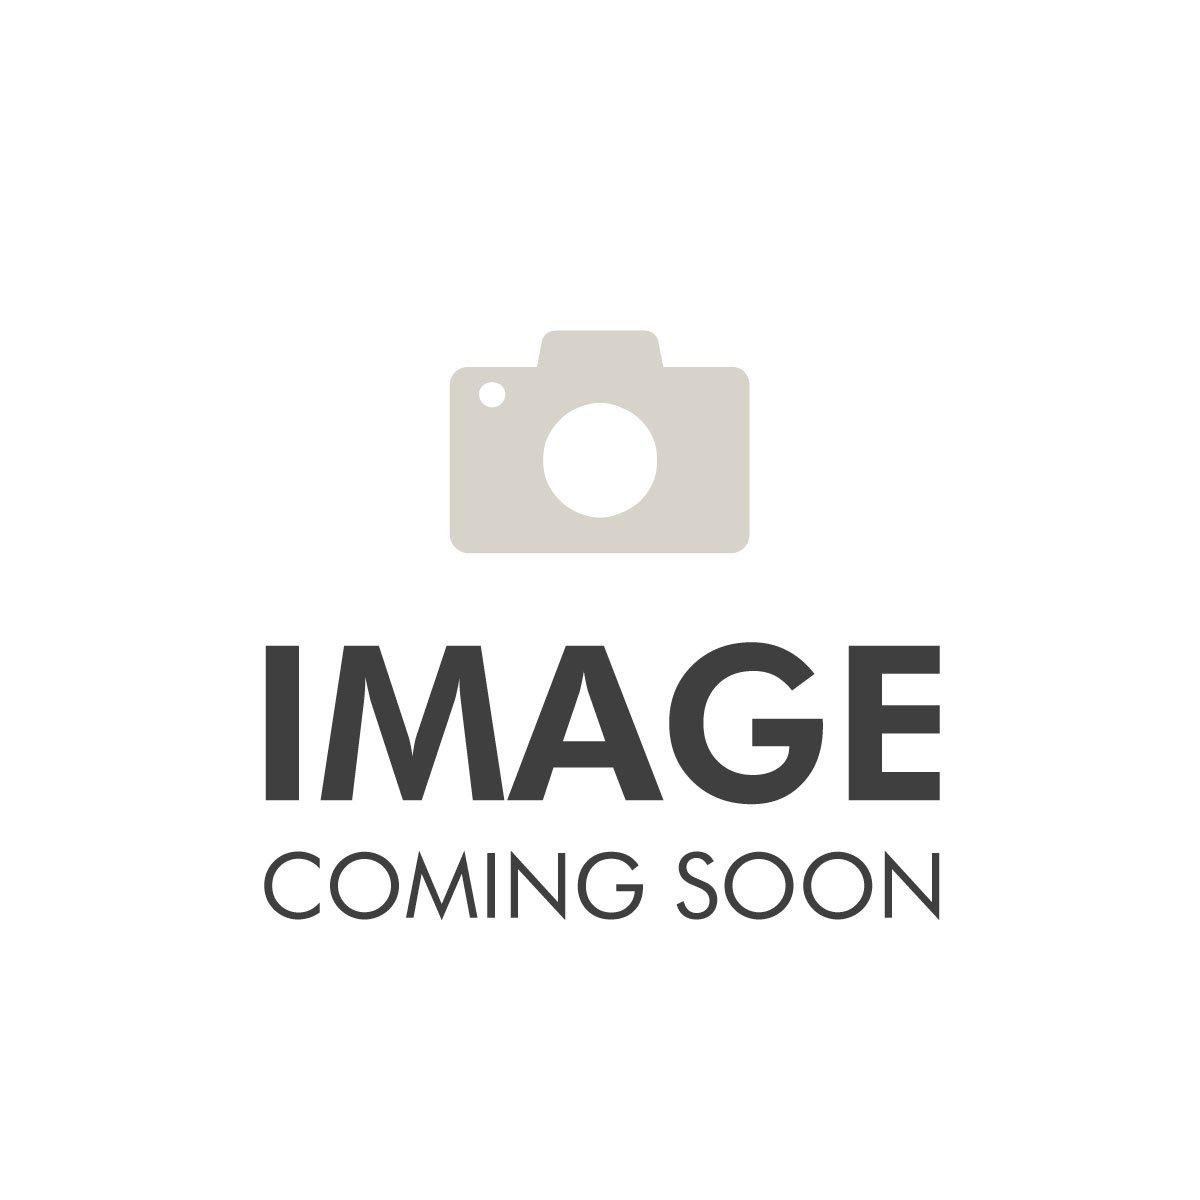 Clarins Shaping Facial Lift Serum 50ml